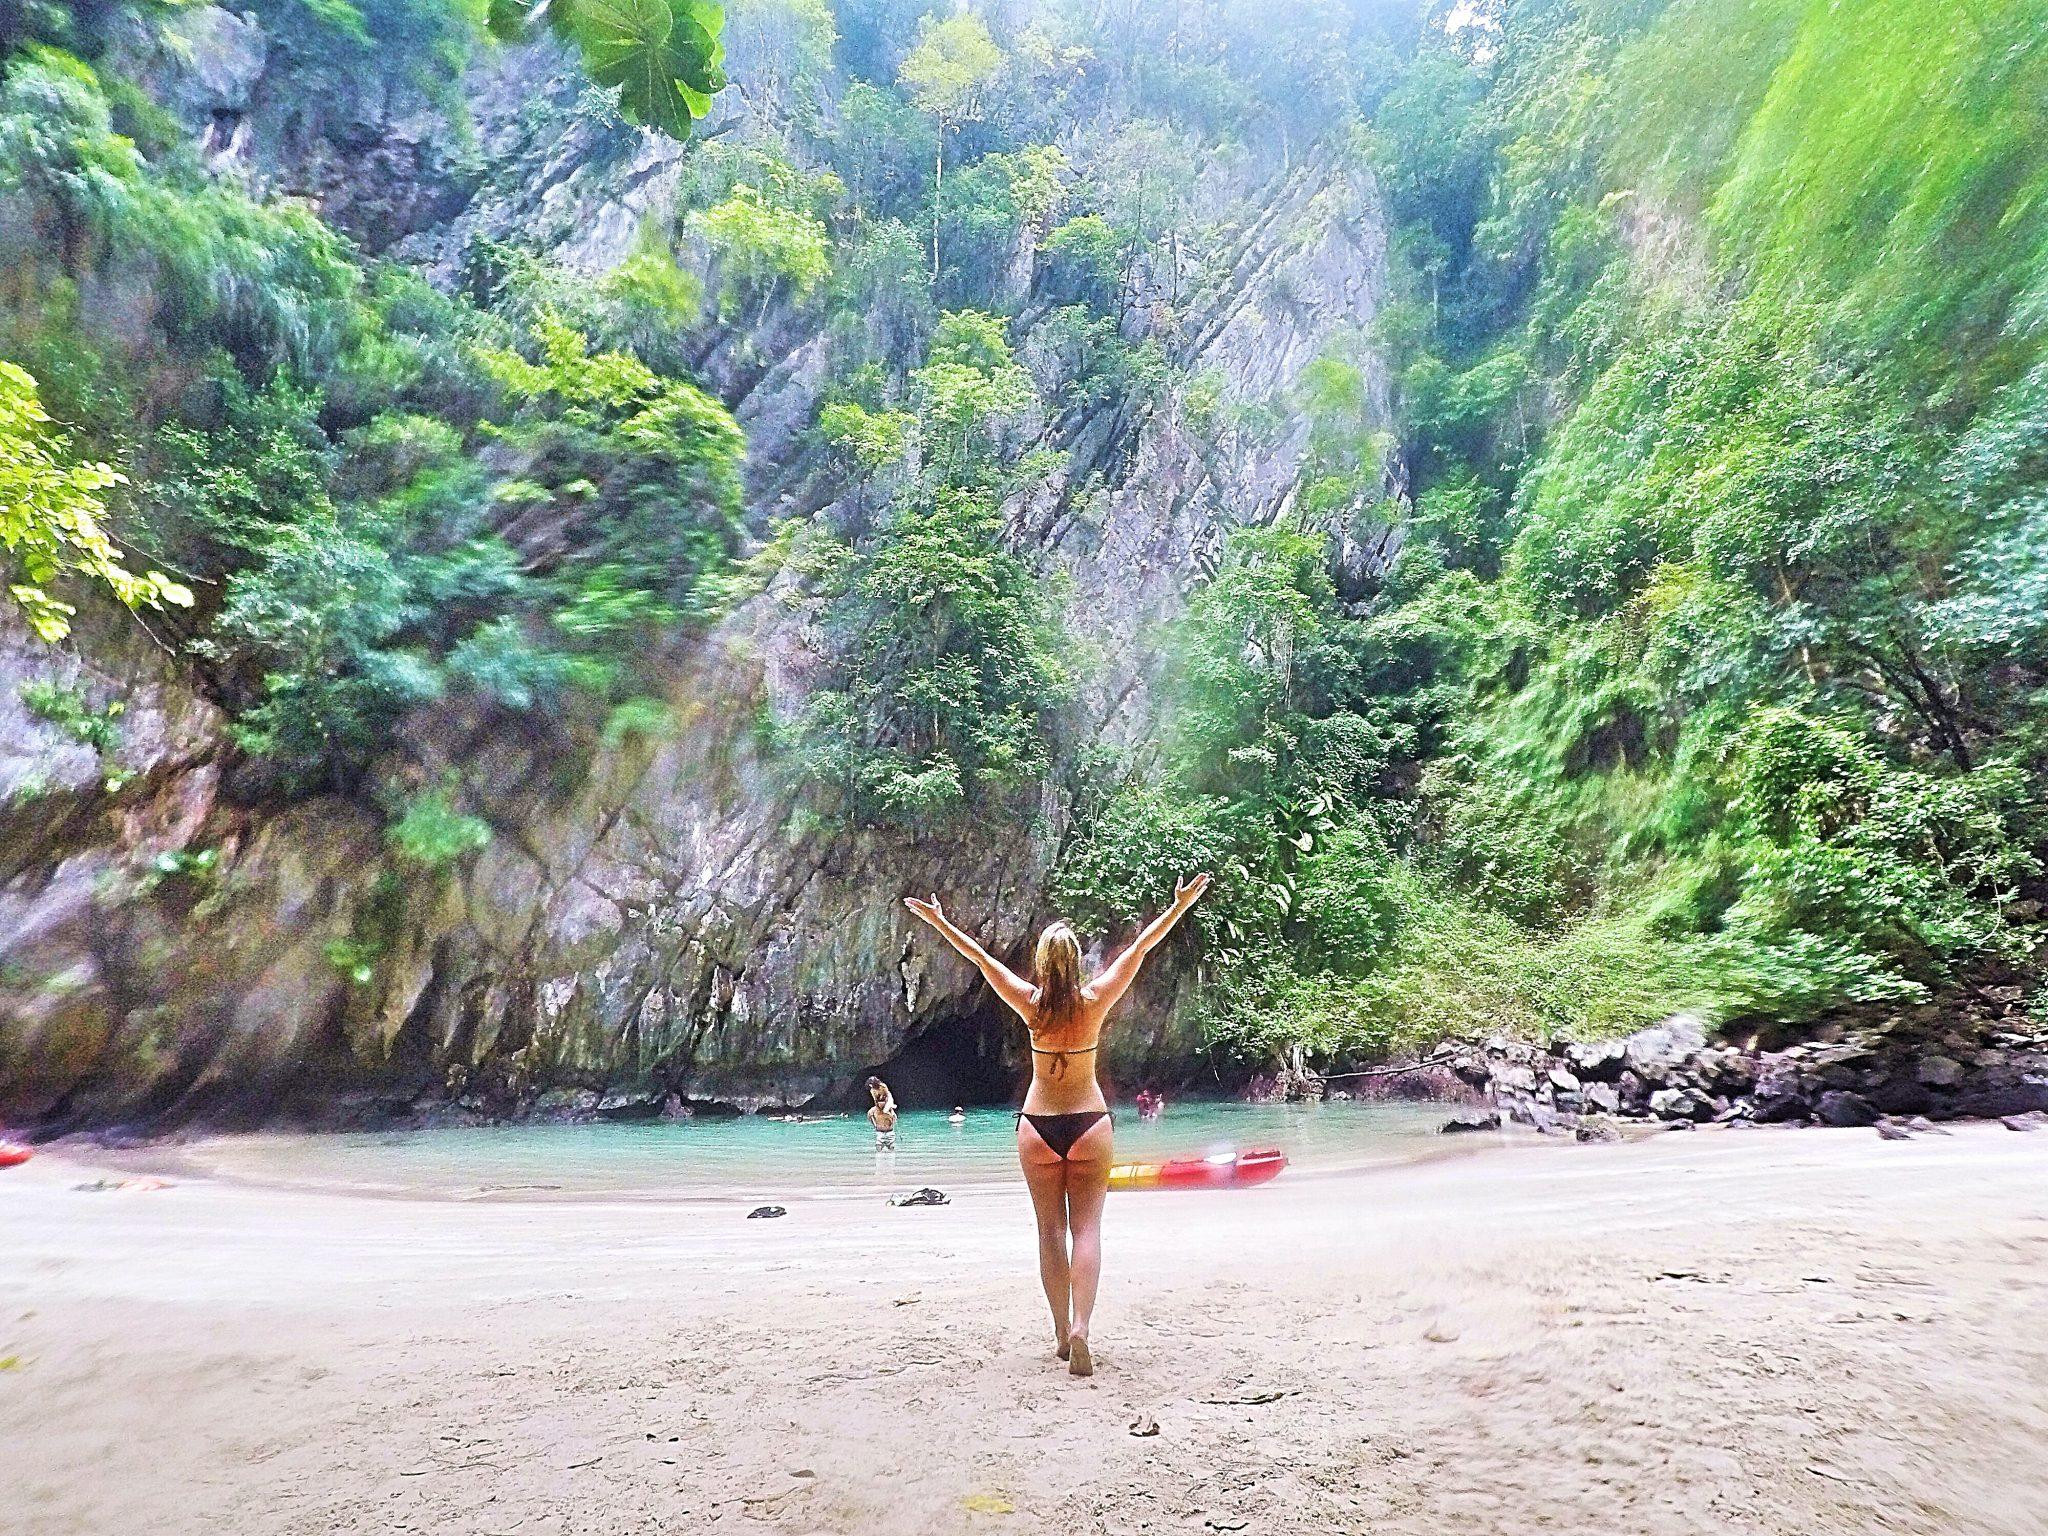 Emerald Cave, Koh Mook